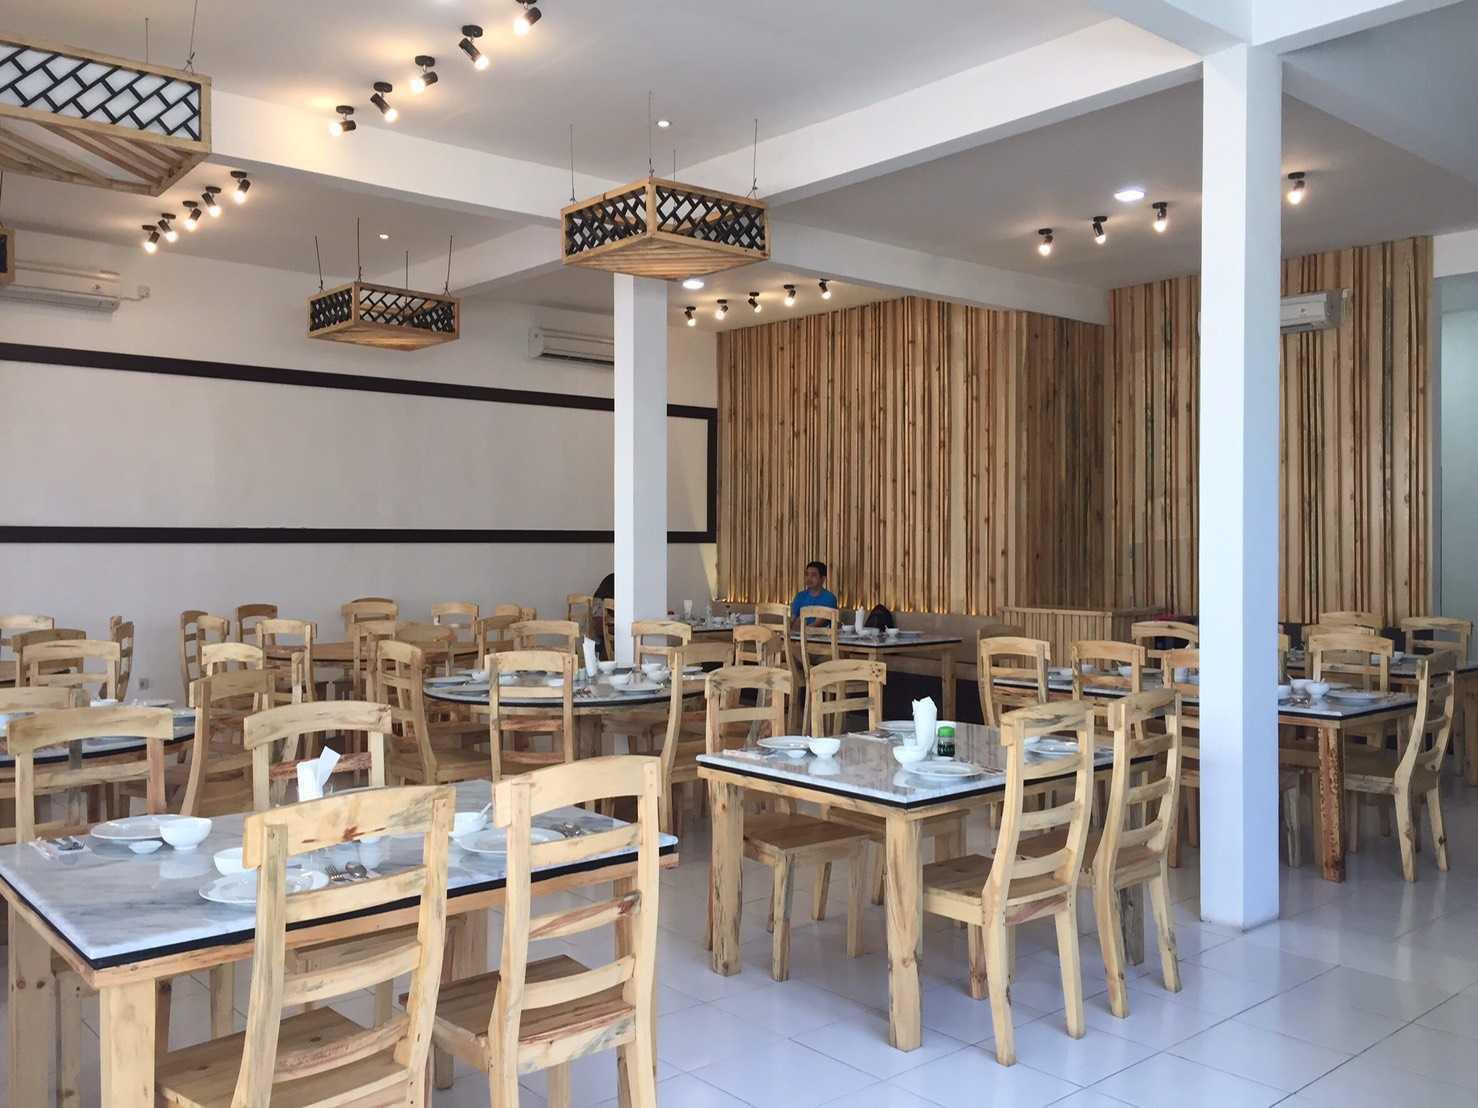 Alima Studio Uncle Chong Restaurant Jl. By Pass Ngurah Rai No.402, Sanur, Denpasar Sel., Bali, 80228, Indonesia Jl. By Pass Ngurah Rai No.402, Sanur, Denpasar Sel., Bali, 80228, Indonesia Alima-Studio-Uncle-Chong-Restaurant  61865